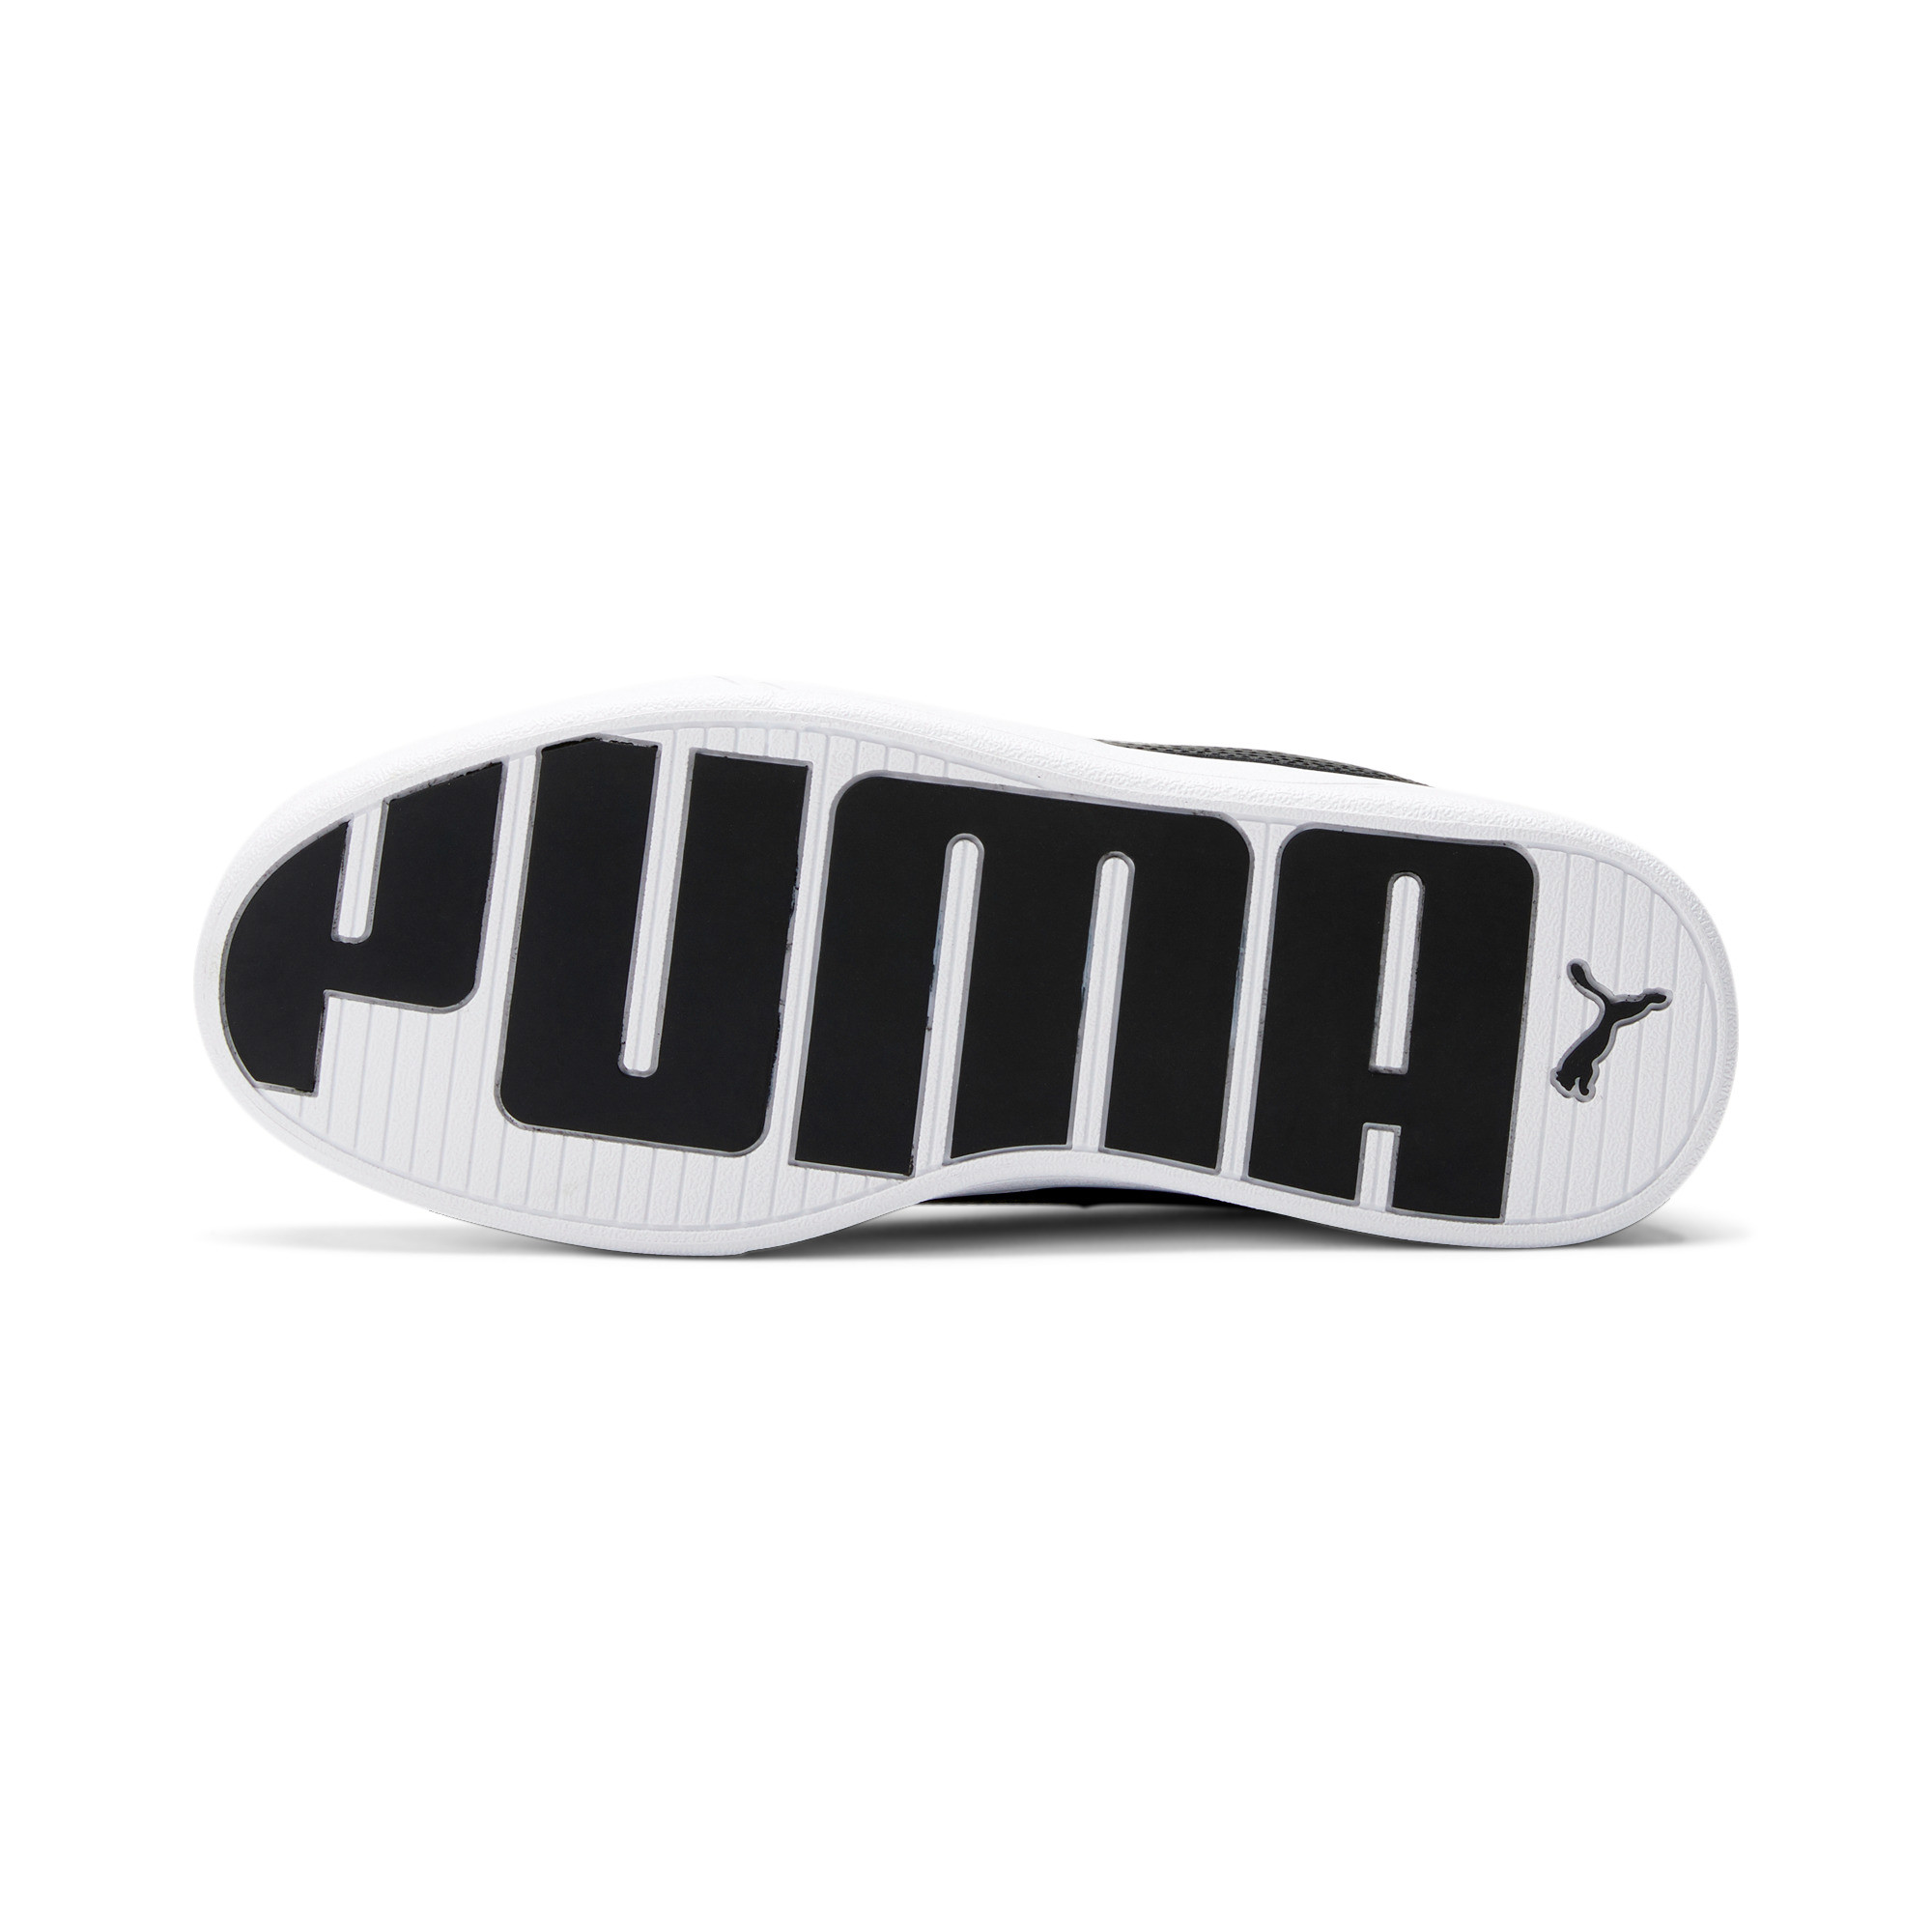 PUMA-Women-039-s-Skye-Sneakers thumbnail 5